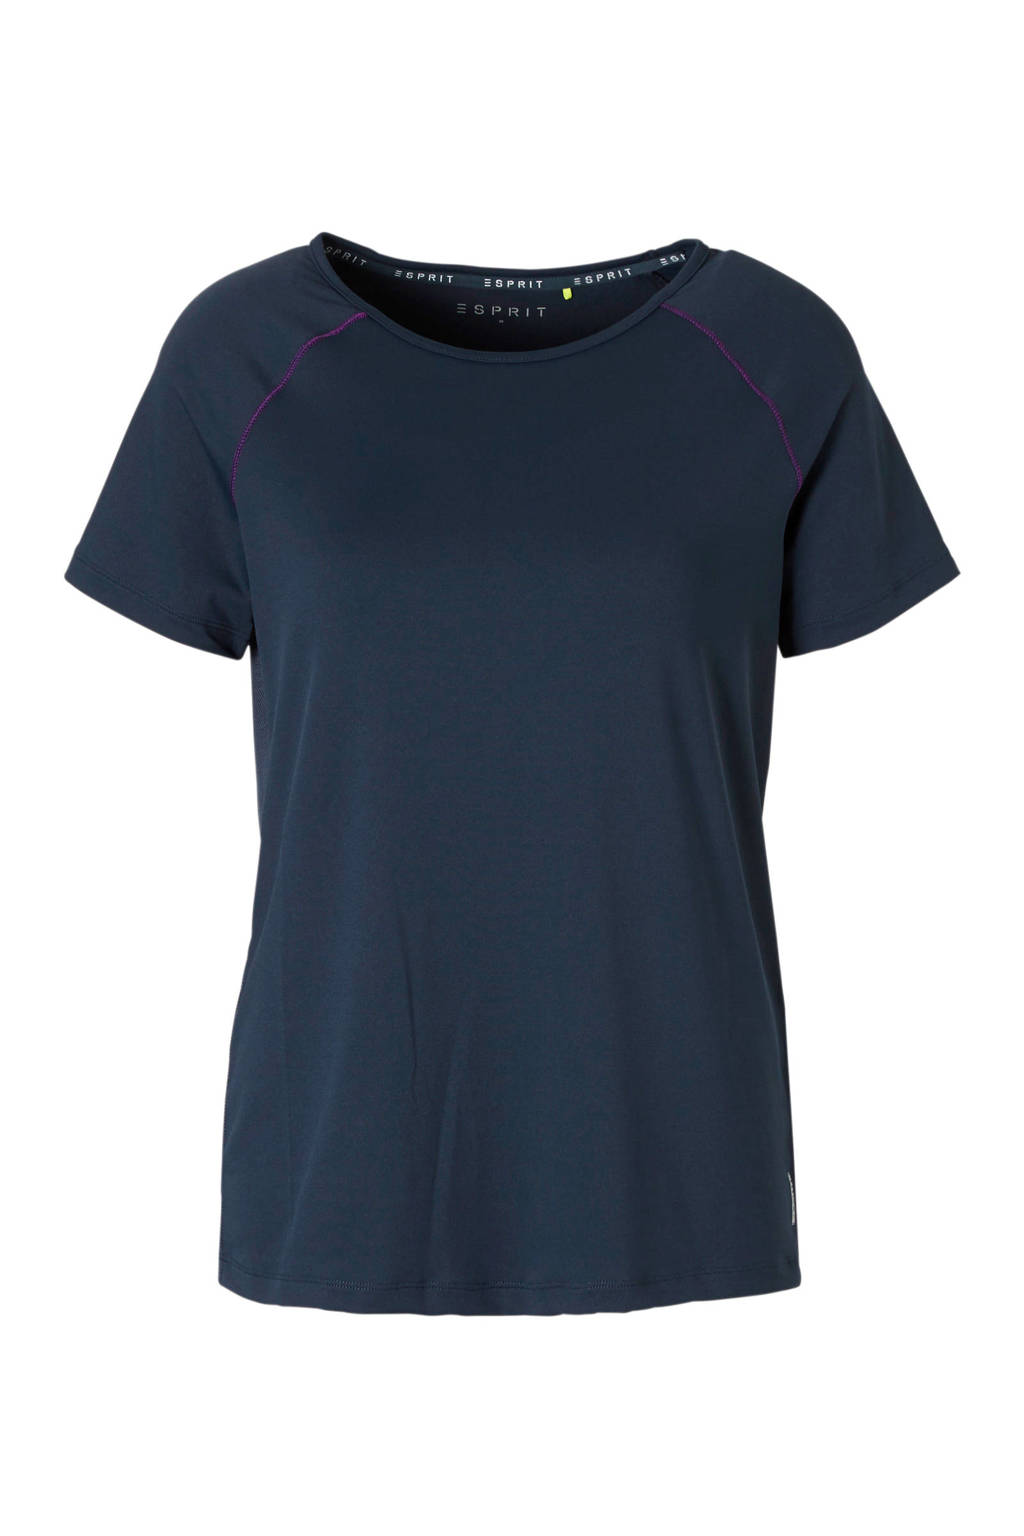 ESPRIT Women Sports T-shirt donkerblauw, Donkerblauw